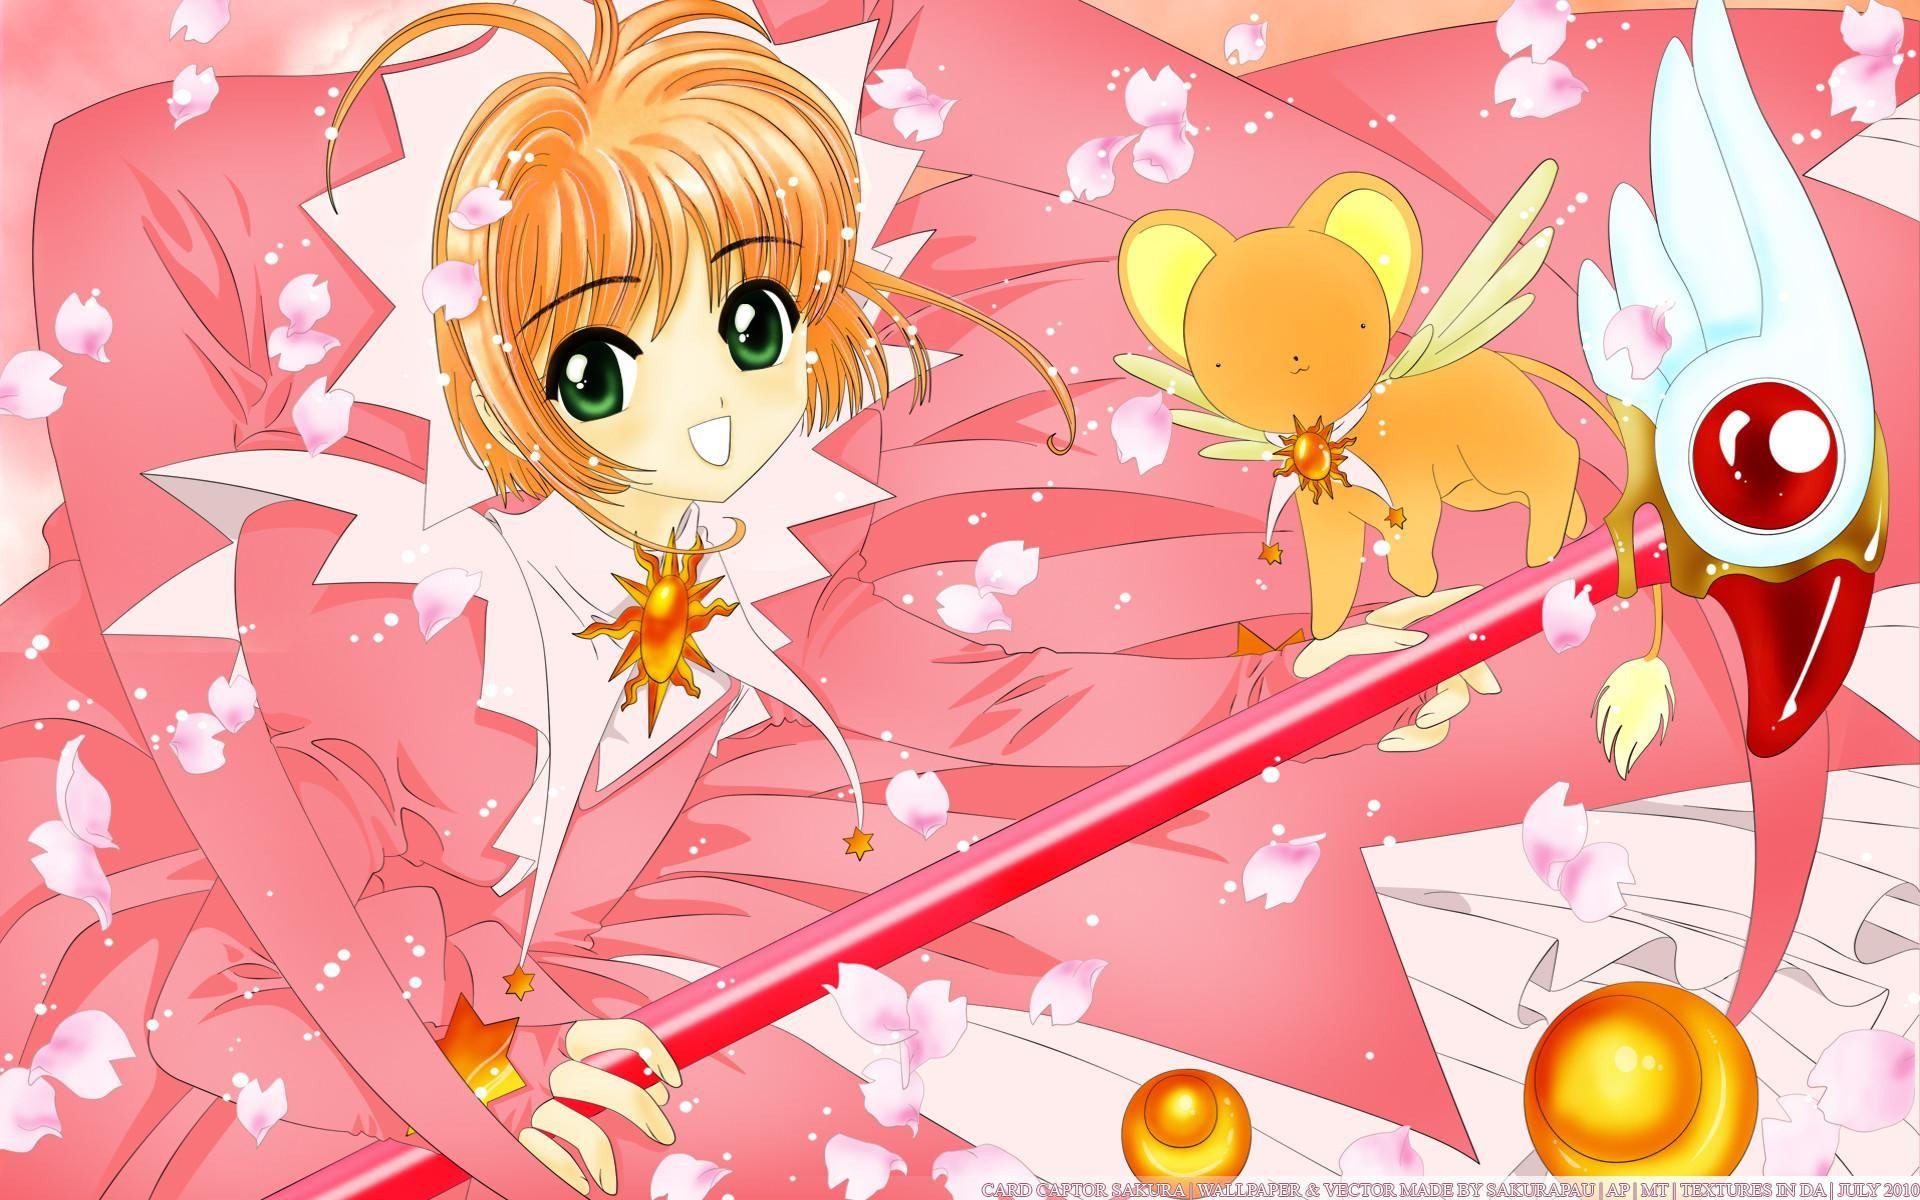 Sakura Cardcaptor Sakura Wallpaper 4560074 Fanpop Hd Wallpapers Sakura Card Anime Cardcaptor Sakura